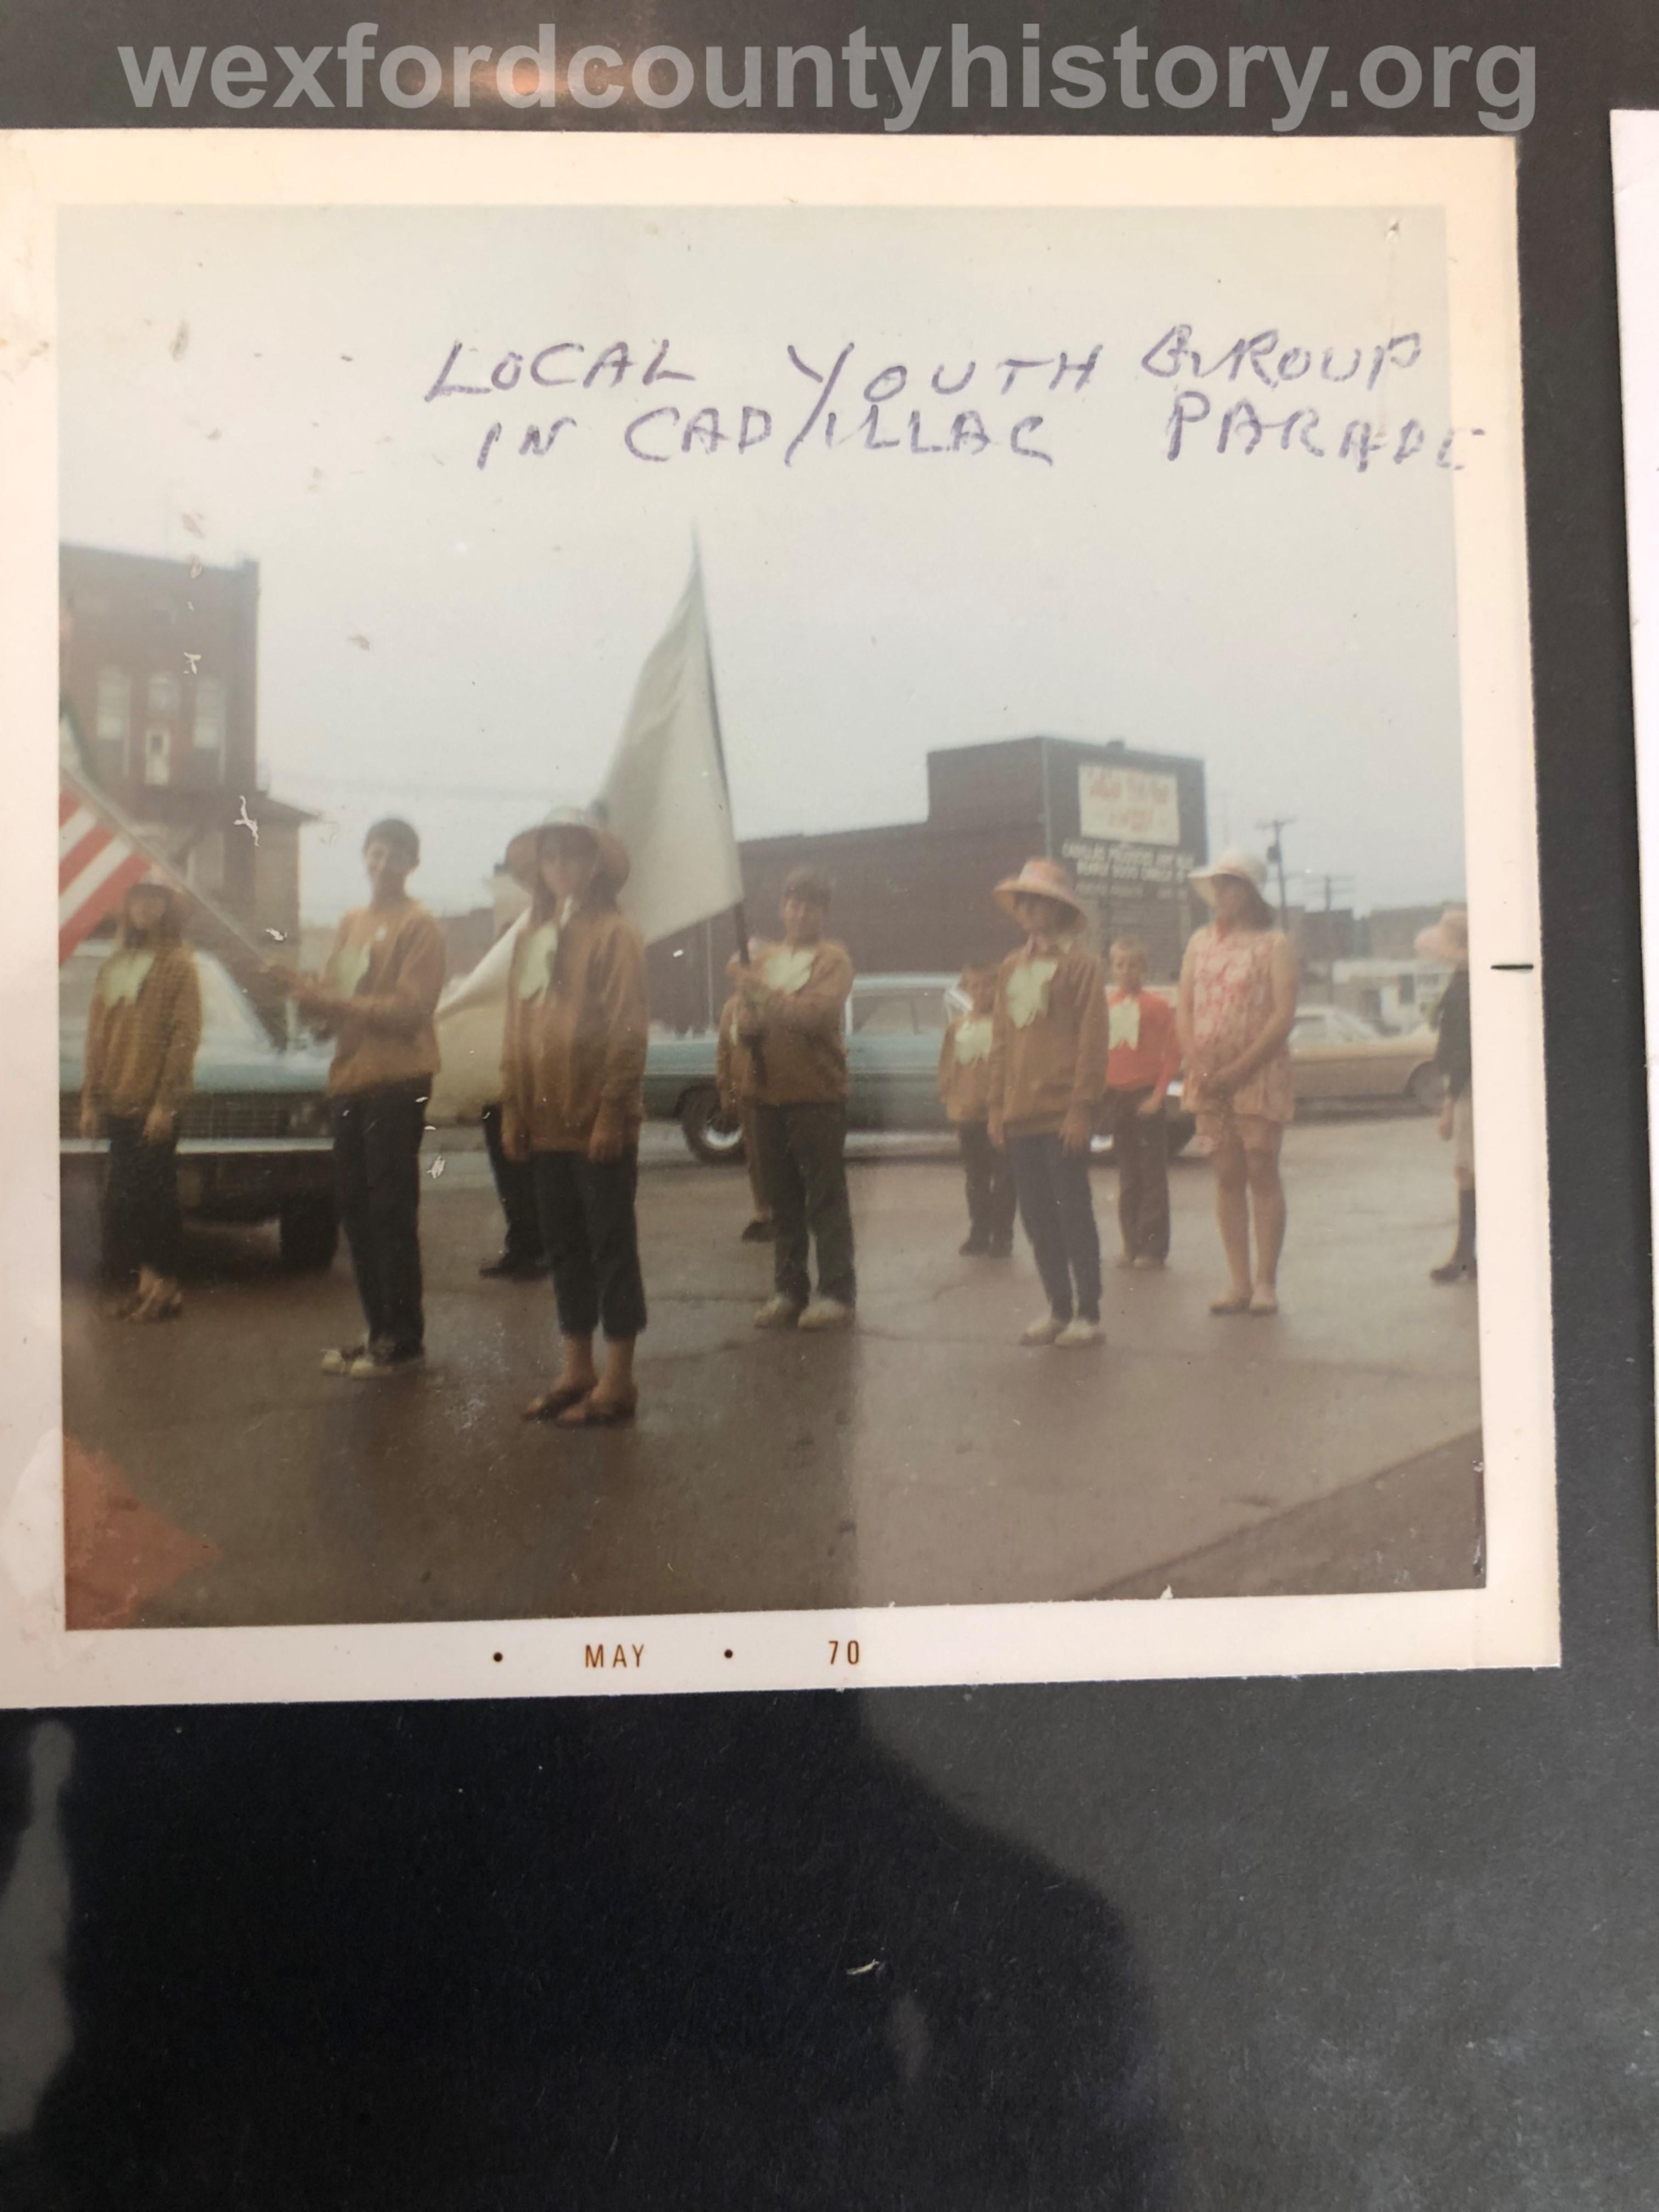 Cadillac-Parade-Local-Youth-Group-In-Parade-3